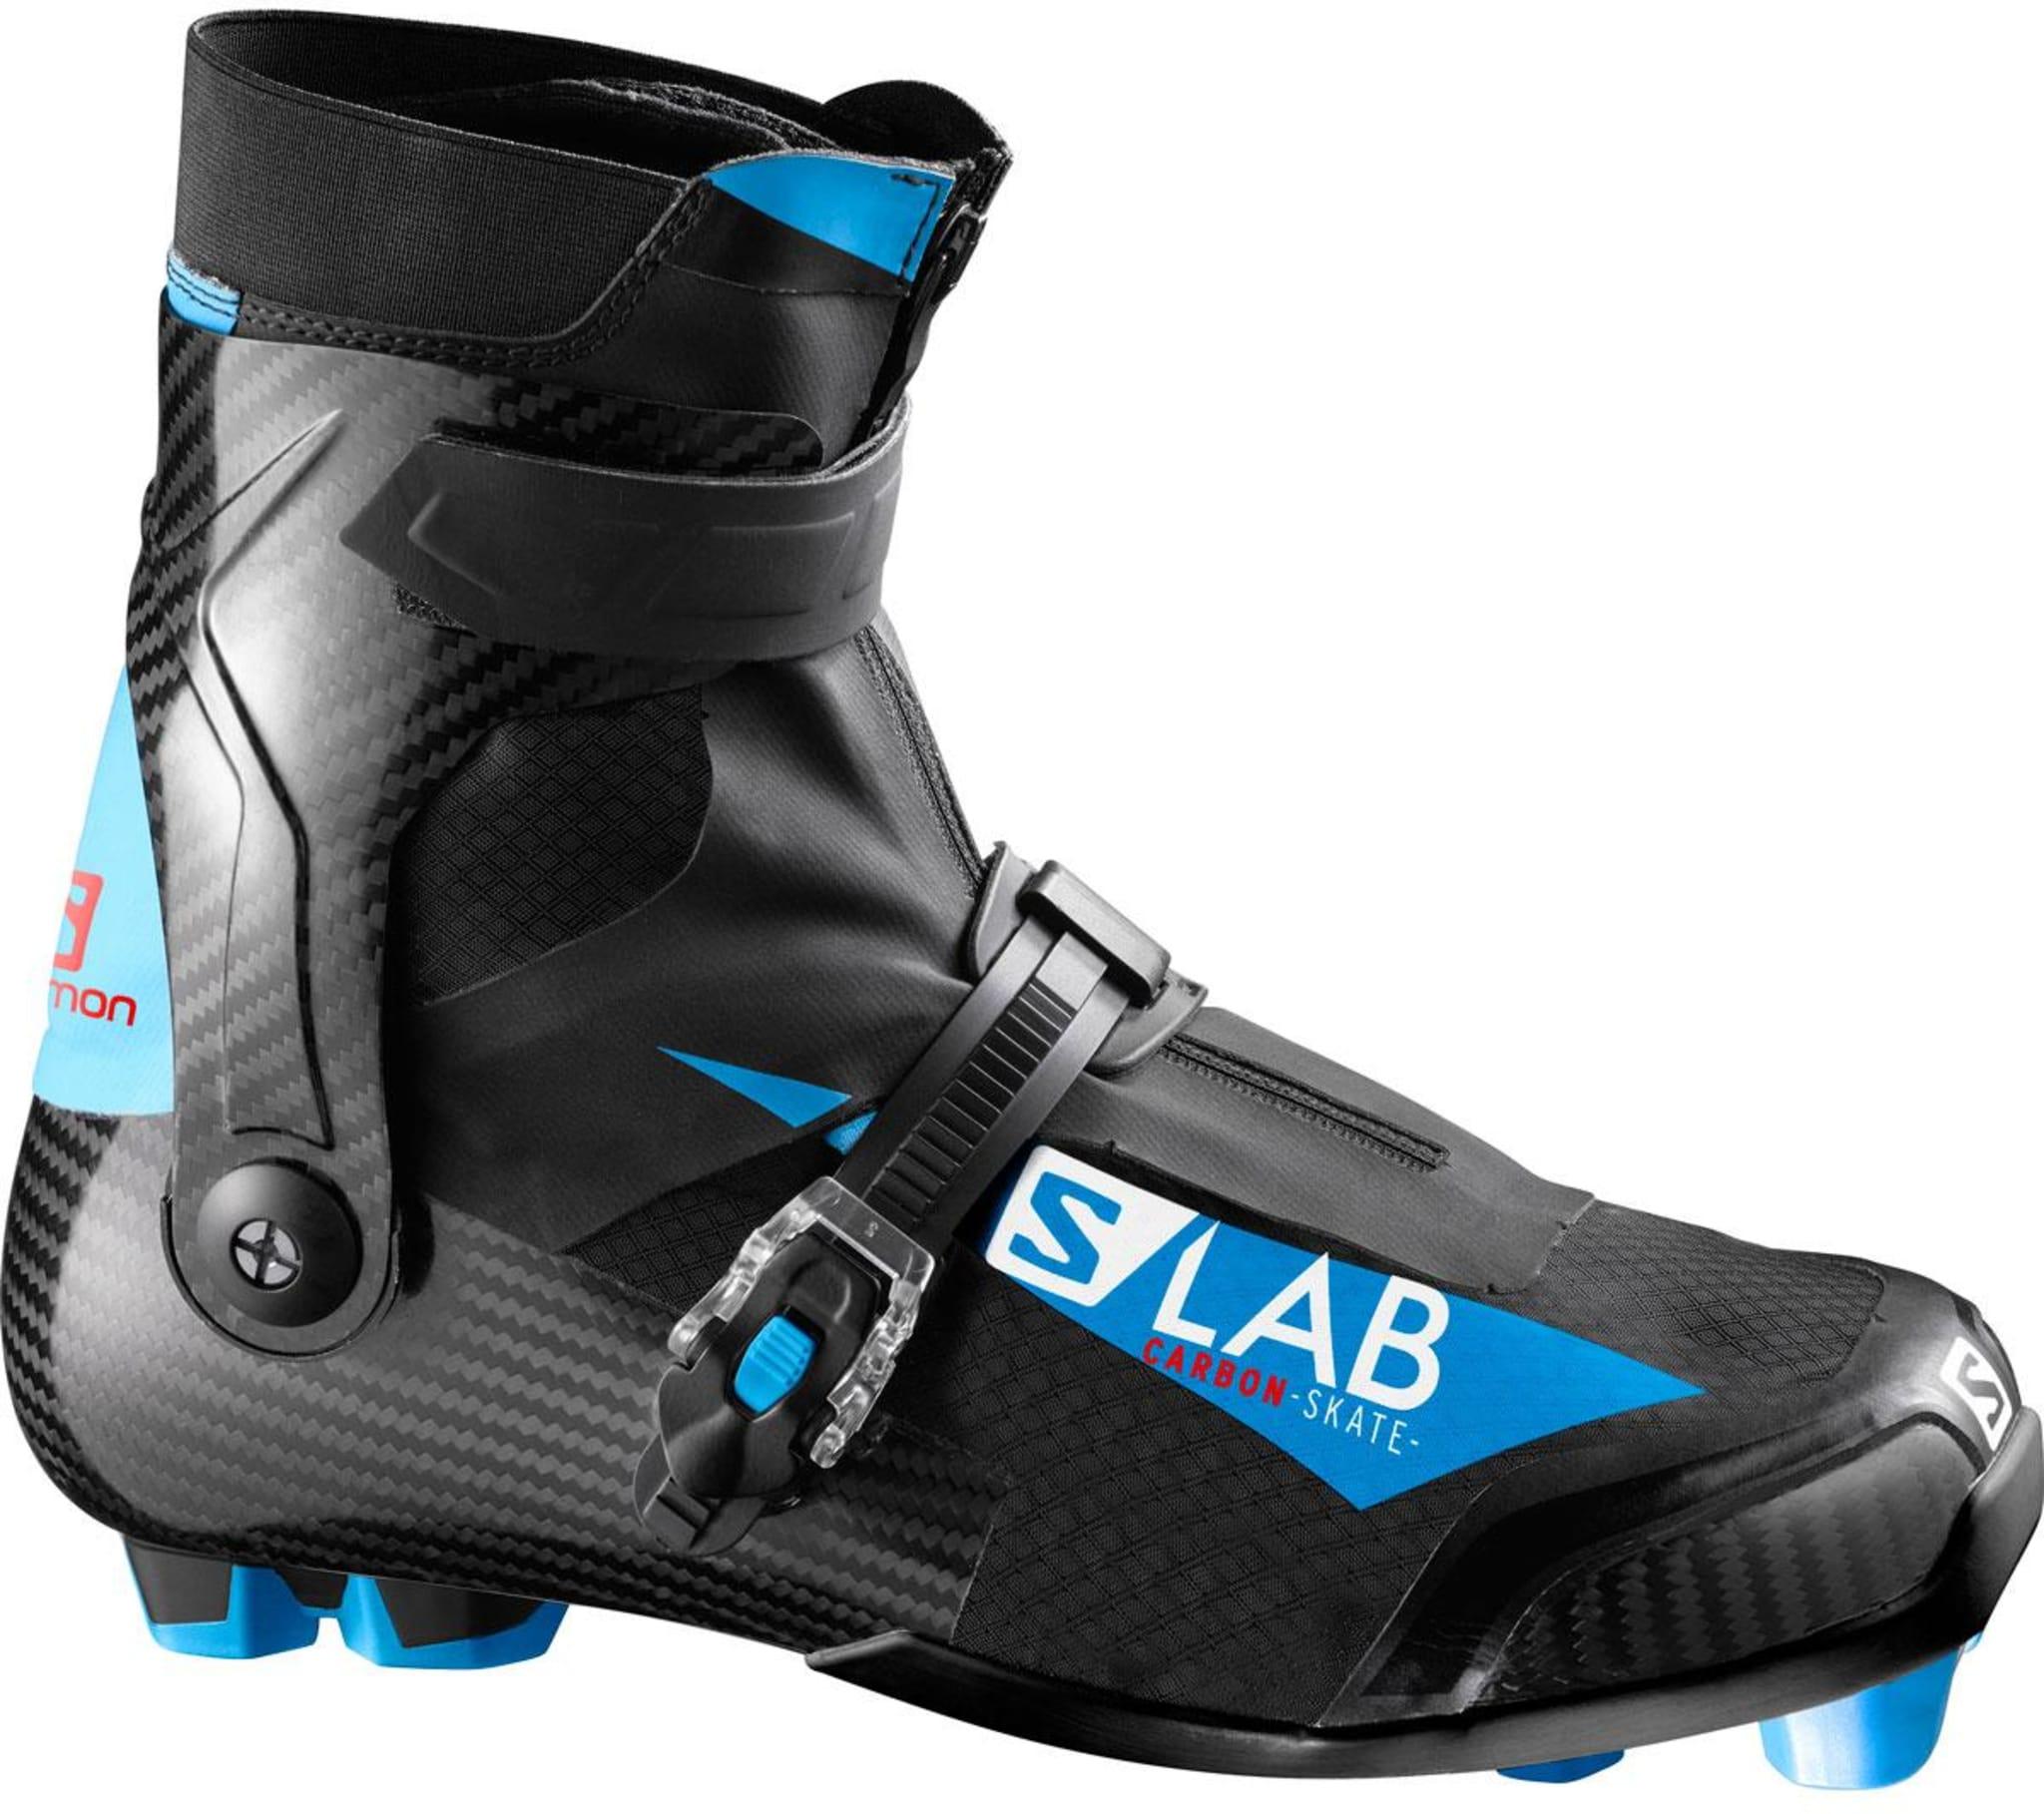 S-LAB skate carbon